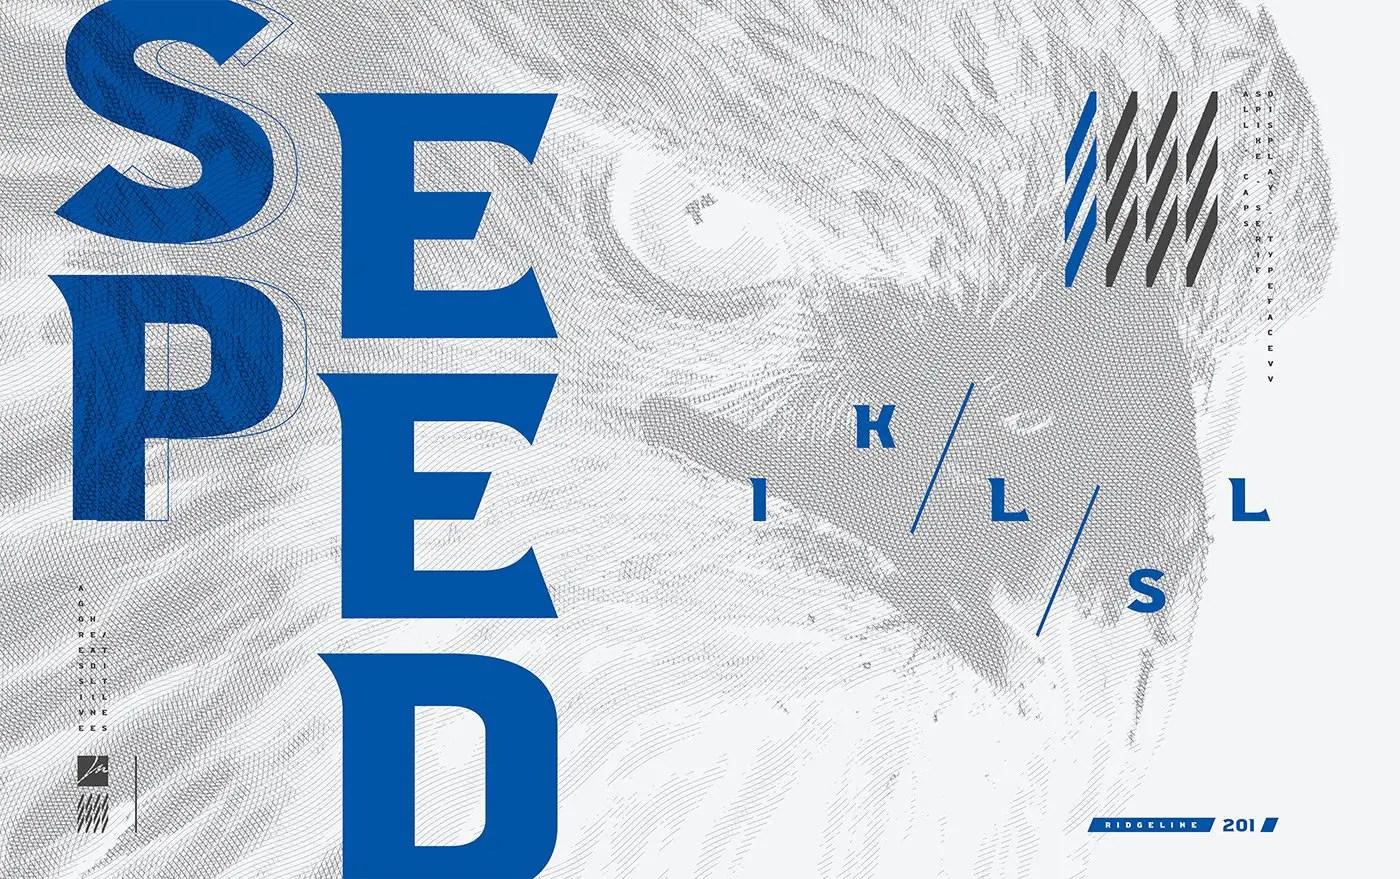 ridgeline-201-typeface-4